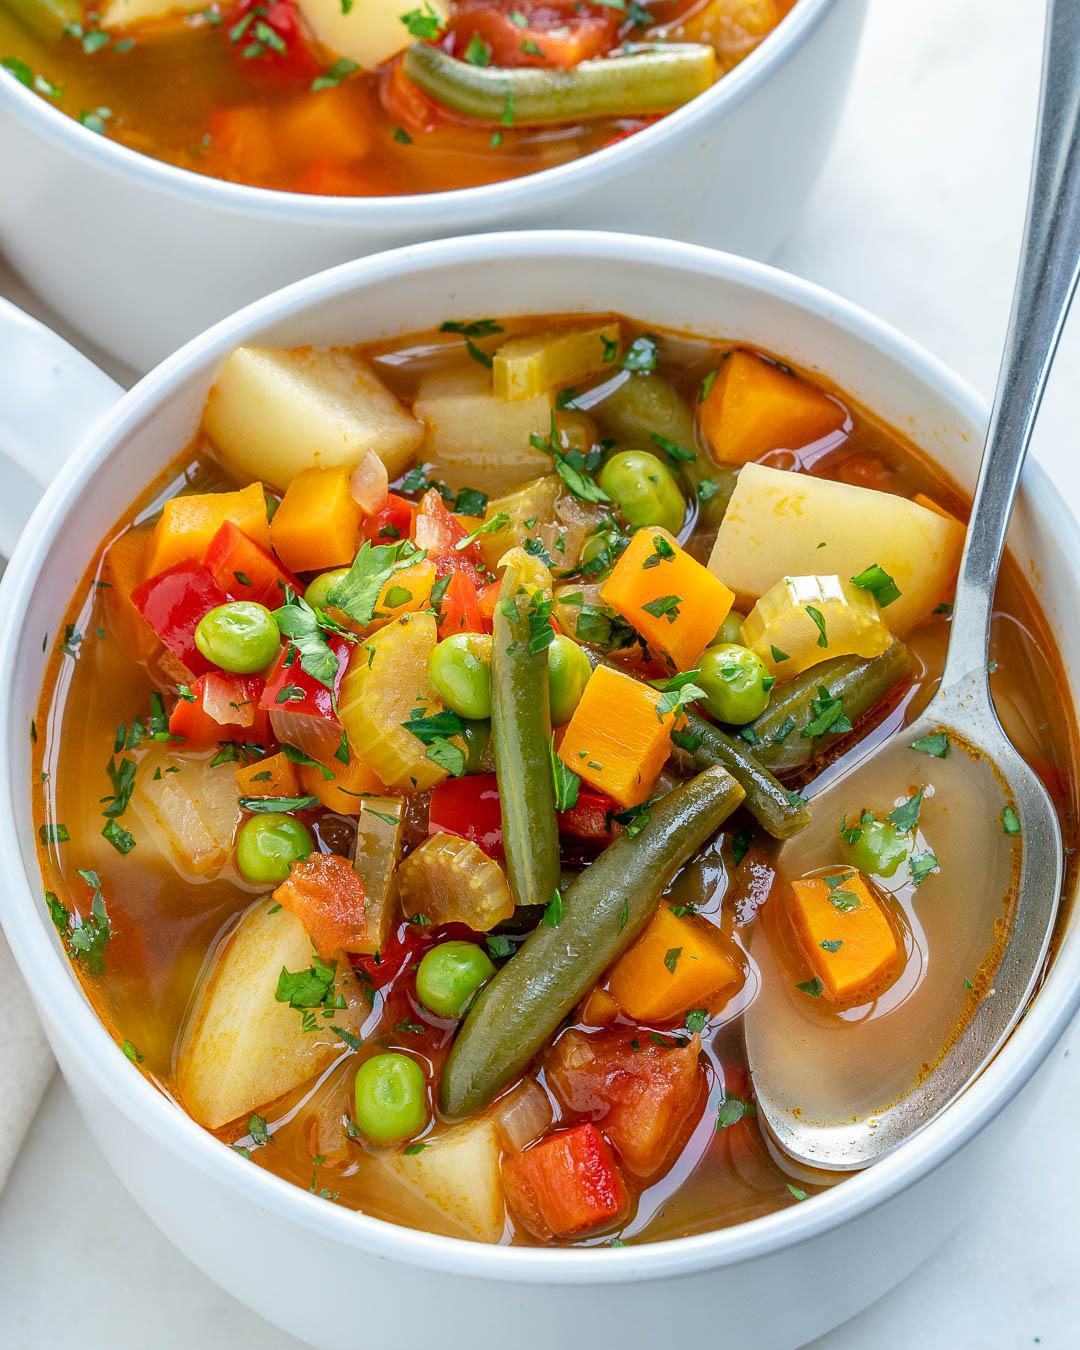 Nourishing Homemade Veggie Soup For Cleansing Lowering